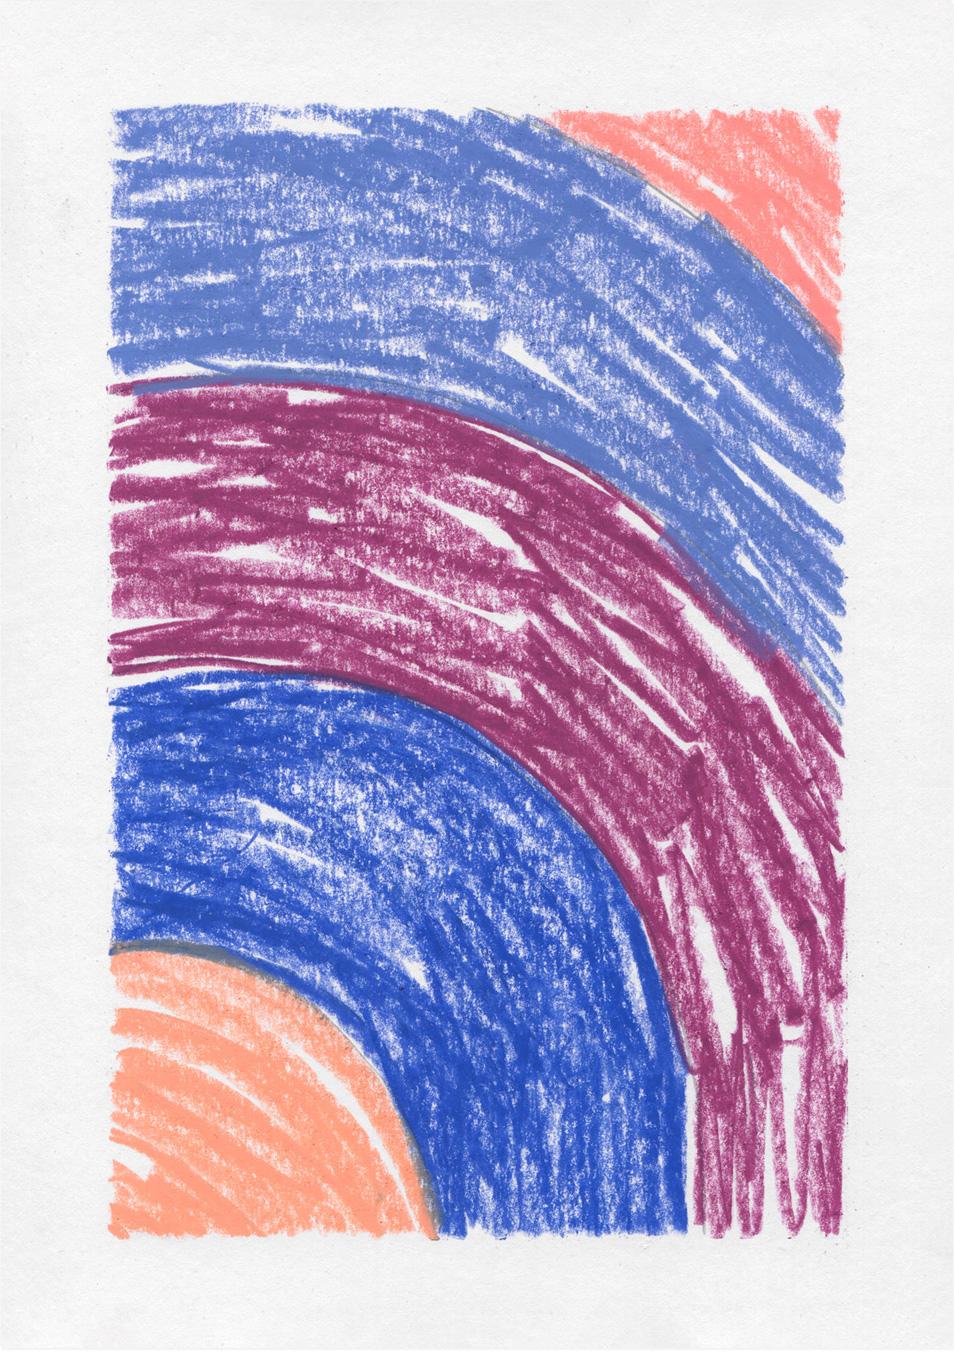 james-watkins-artist-work-on-paper-2